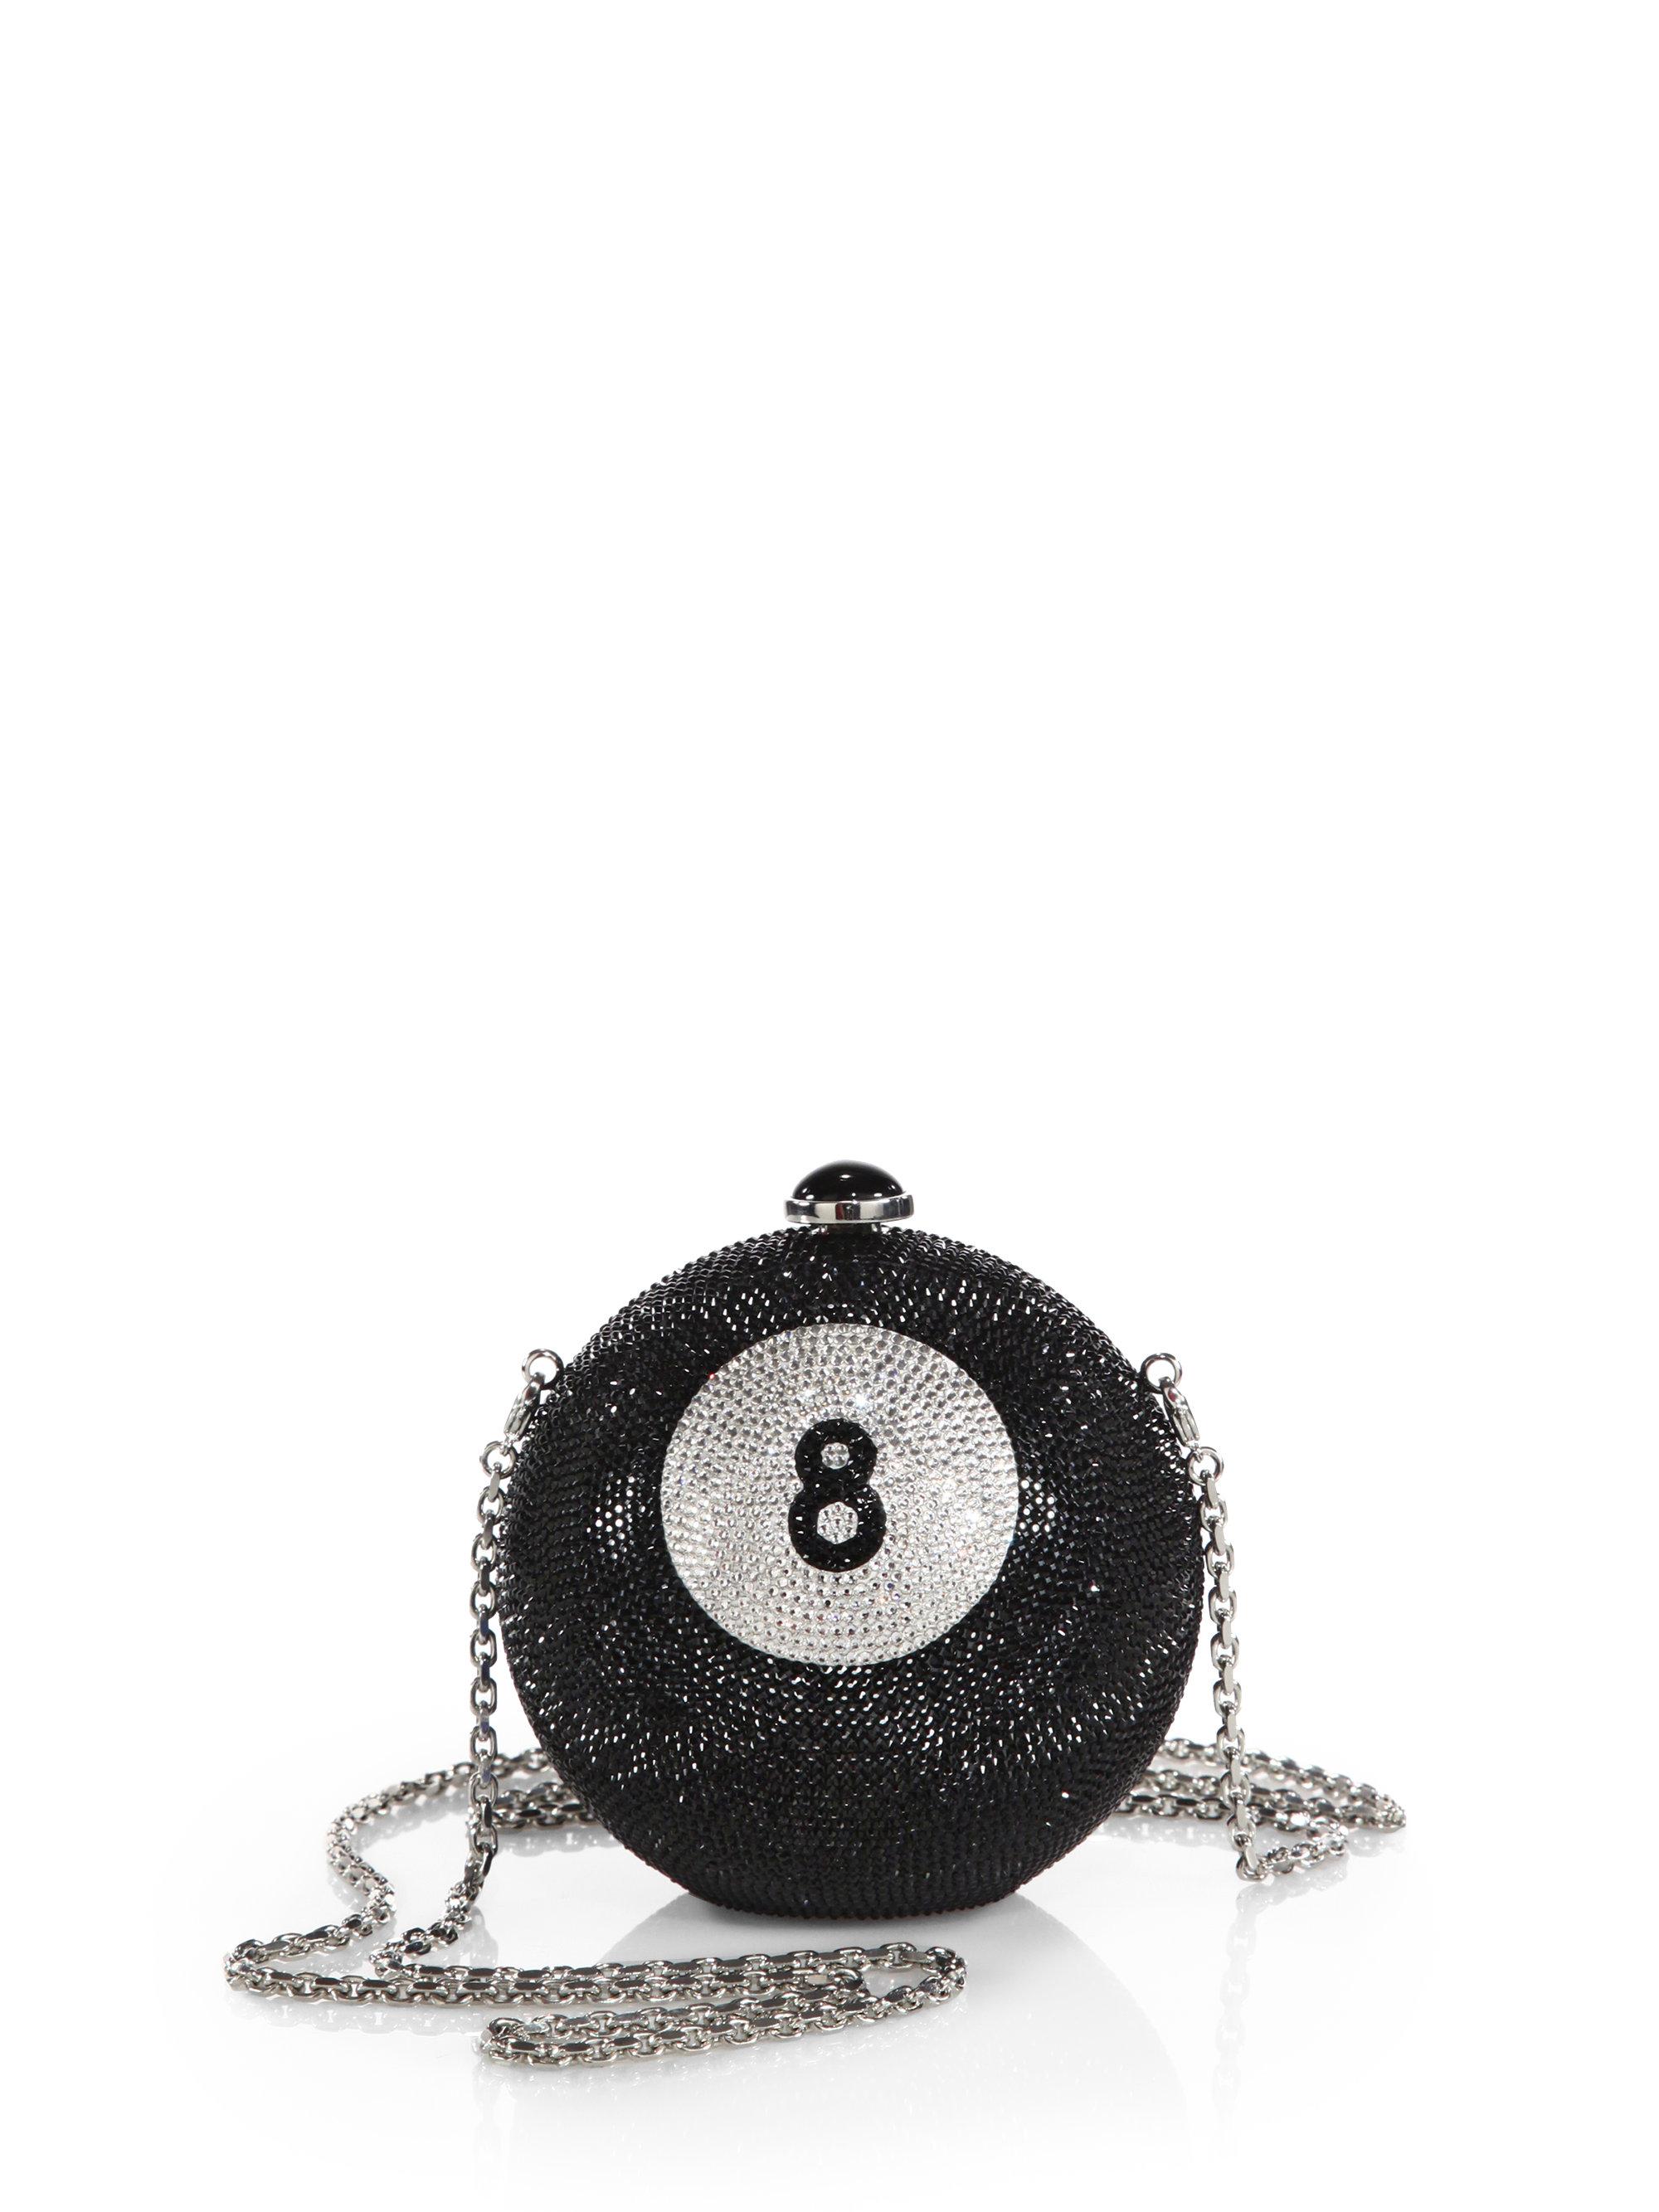 Judith Leiber Eight Ball Swarovski Crystal Clutch In